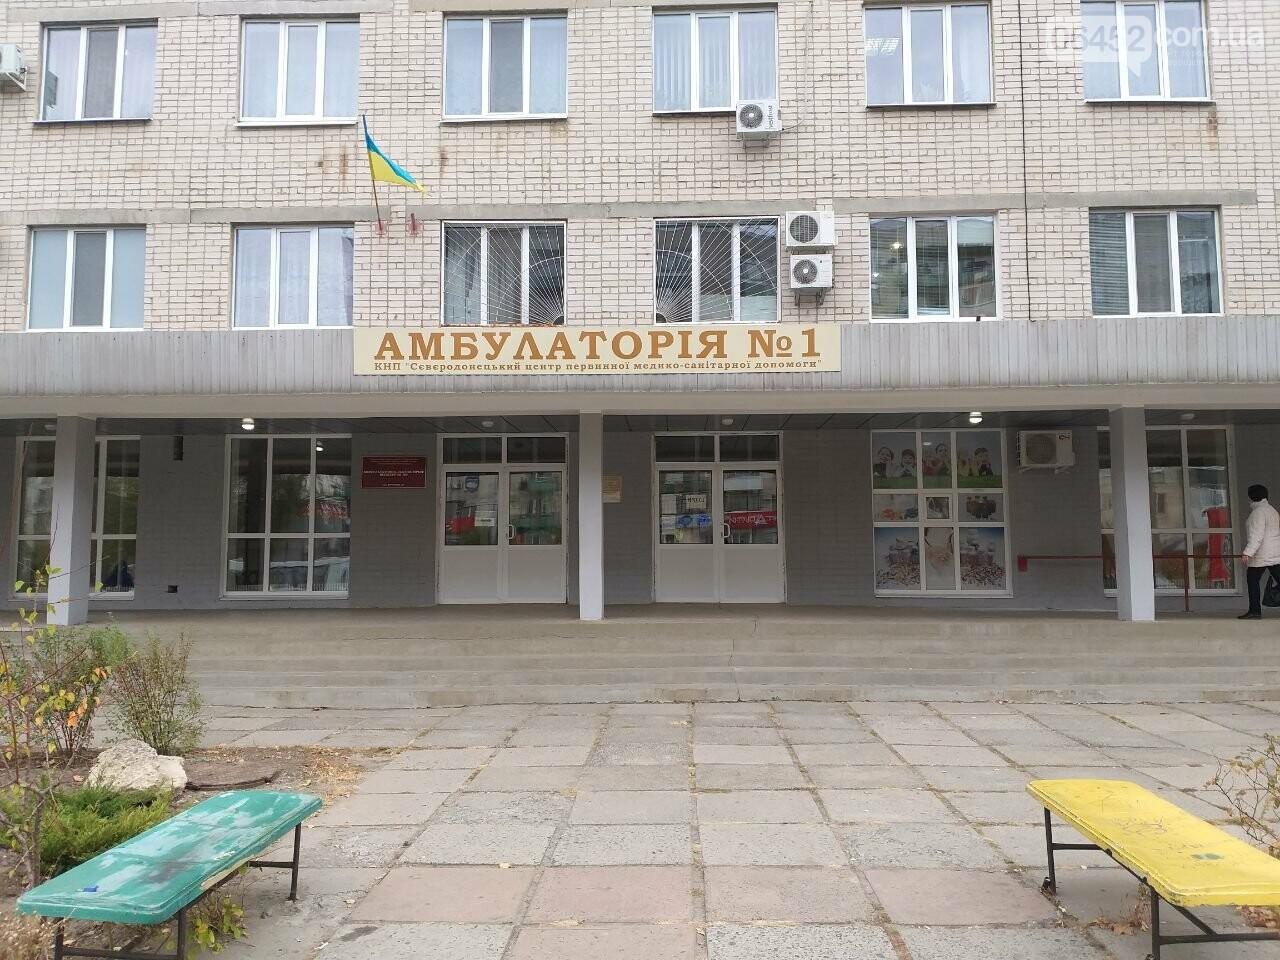 Амбулатории Северодонецка в условиях коронавируса: как работают и какие врачи принимают , фото-1